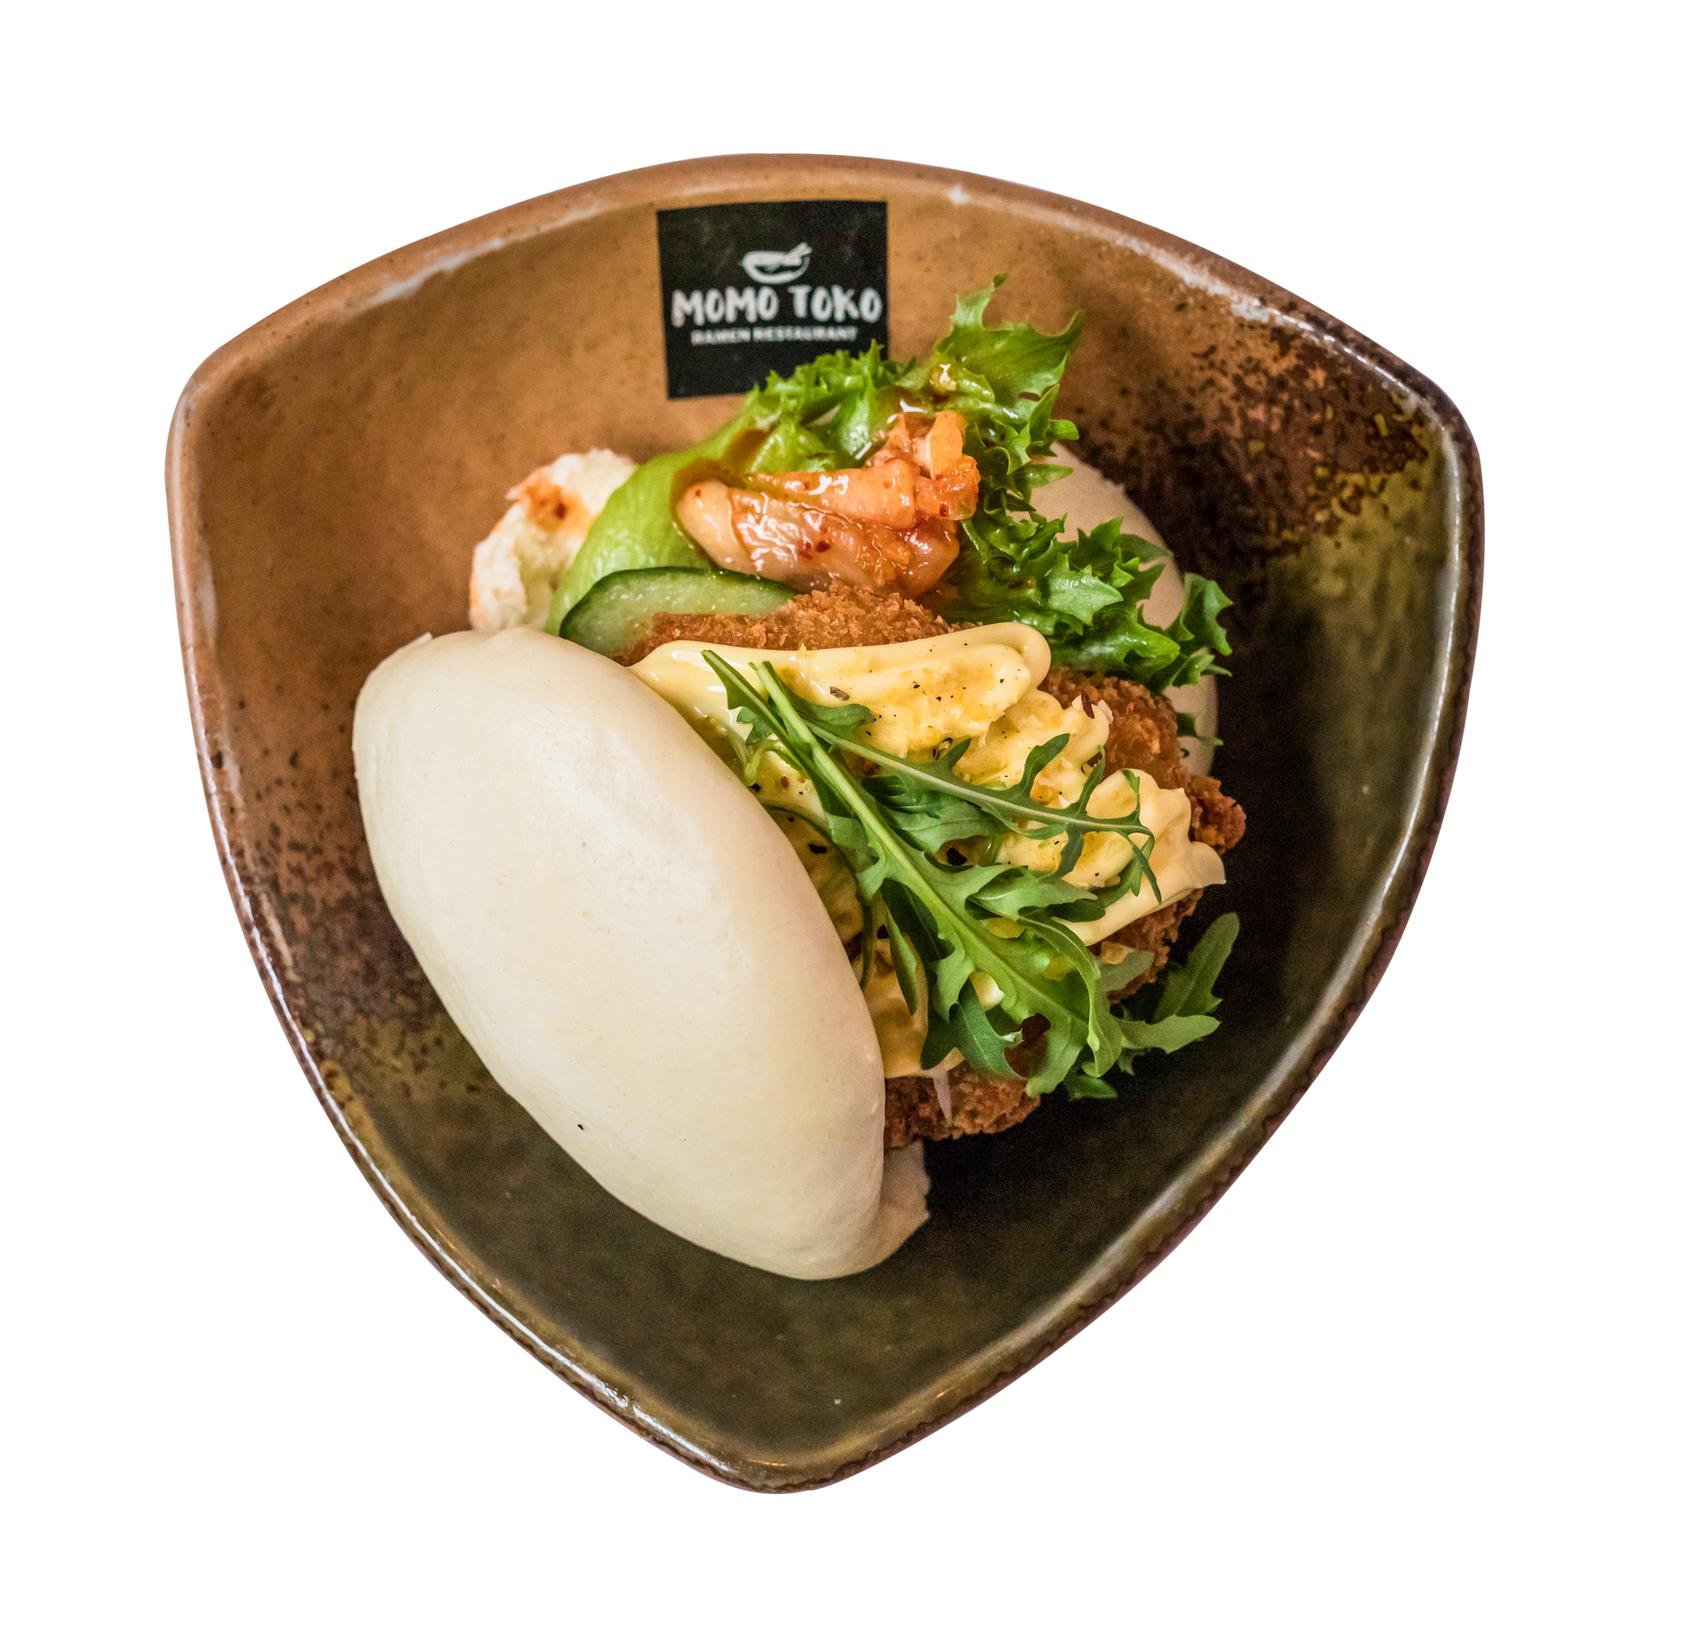 Fried Chicken Bao -6,50€ - Steamed Bun, Deep Fried Chicken, Kimchi, Salad, Cucumber, Arugula, Scallions & Lemon-Garlic Mayo(G, M)